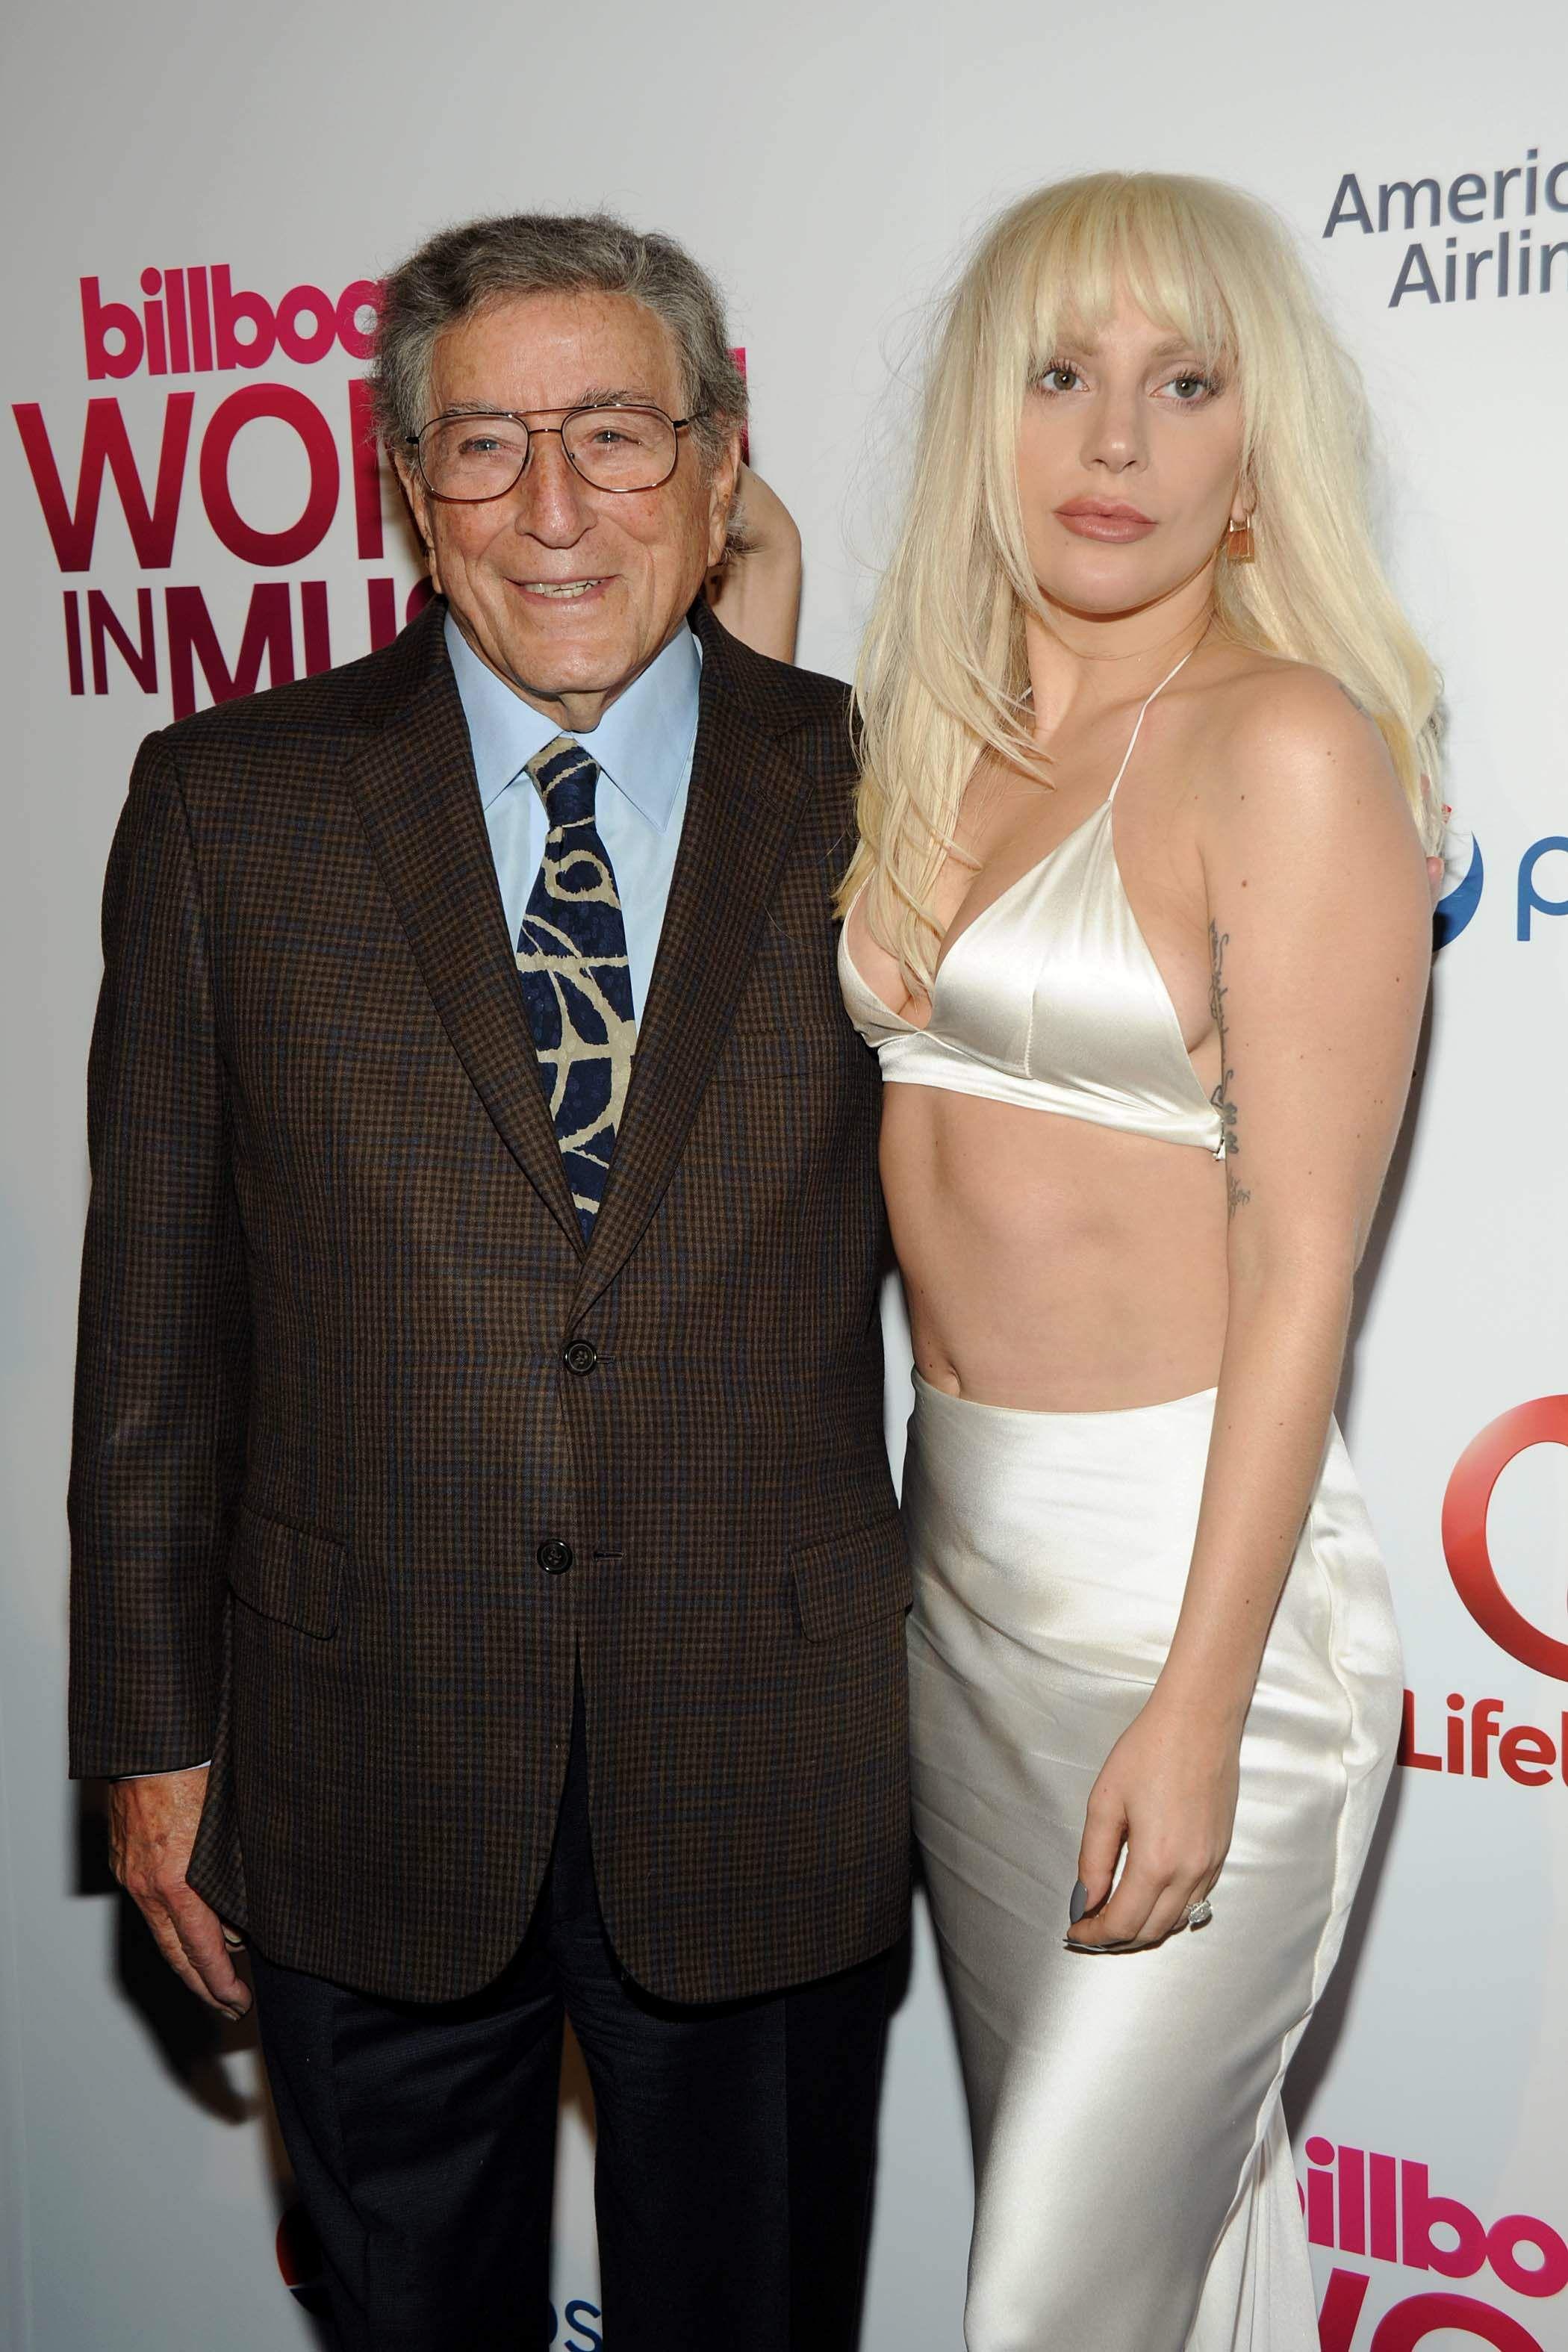 Lady-Gaga-Cleavage-111